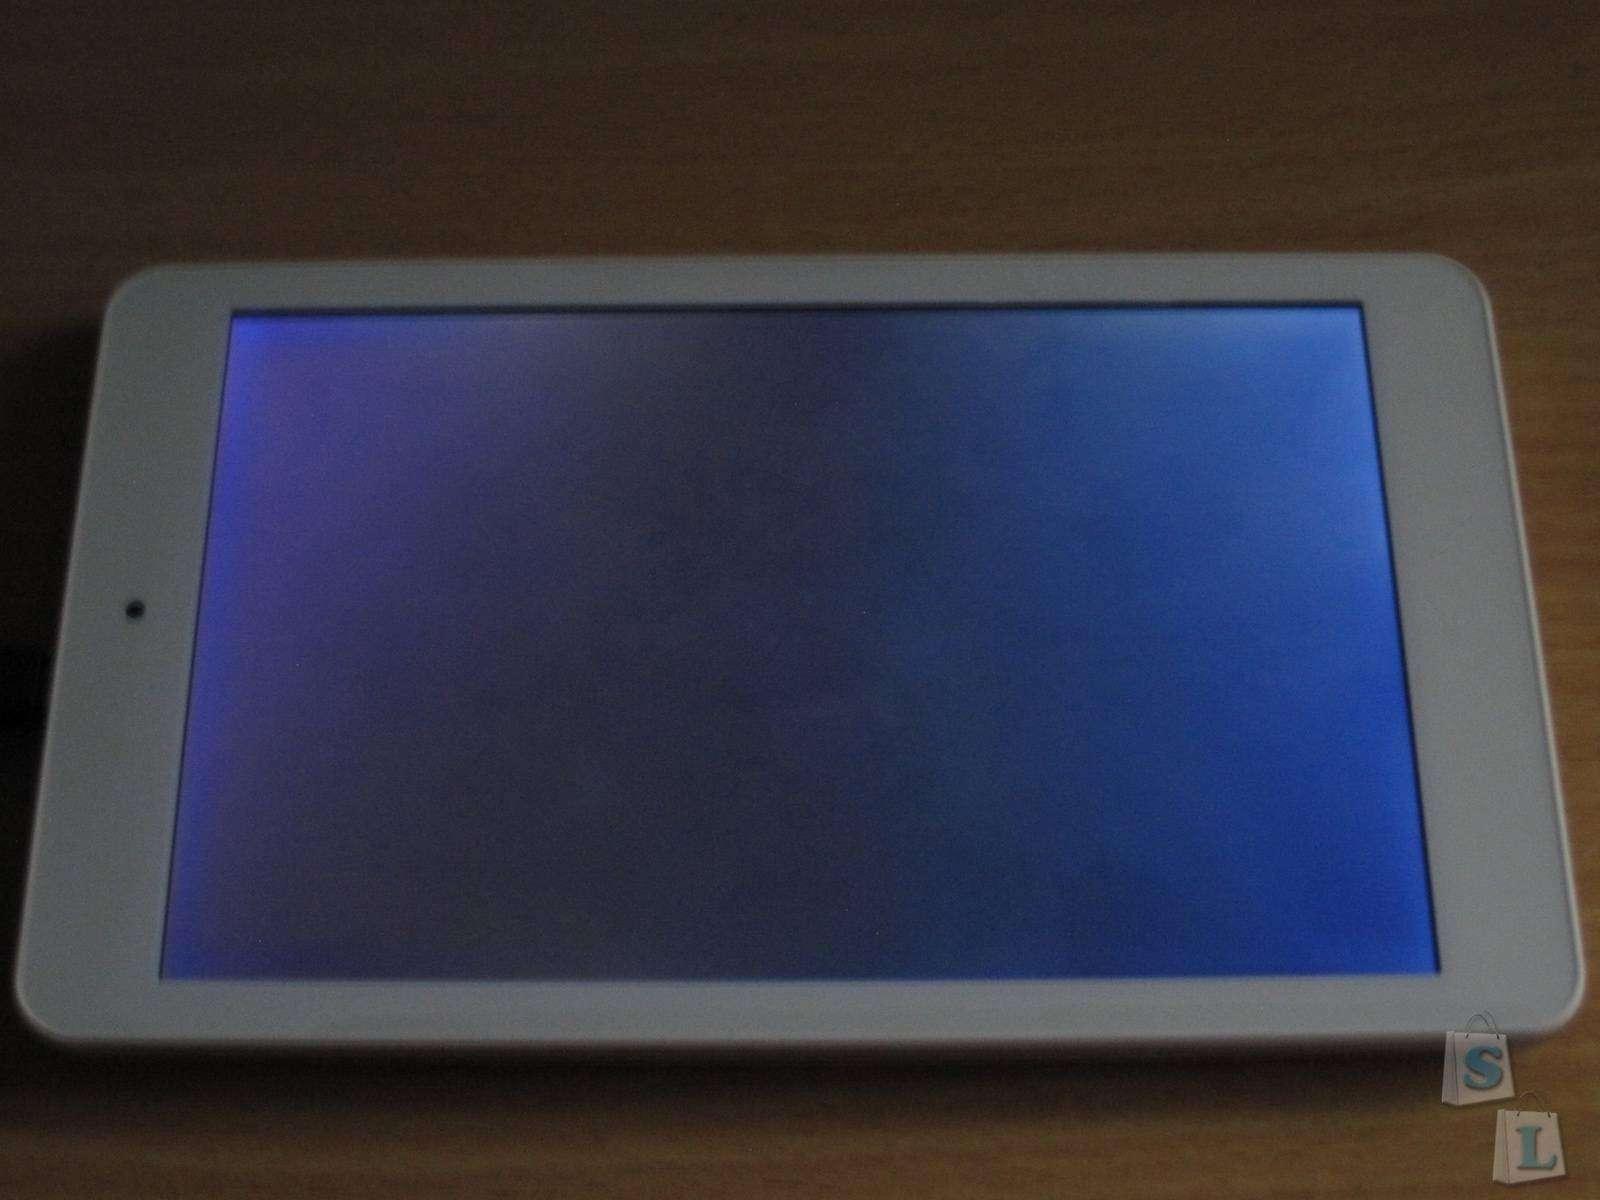 GearBest: Cube iwork8 Ultimate, небольшой Windows планшет на Atom x5-Z8300